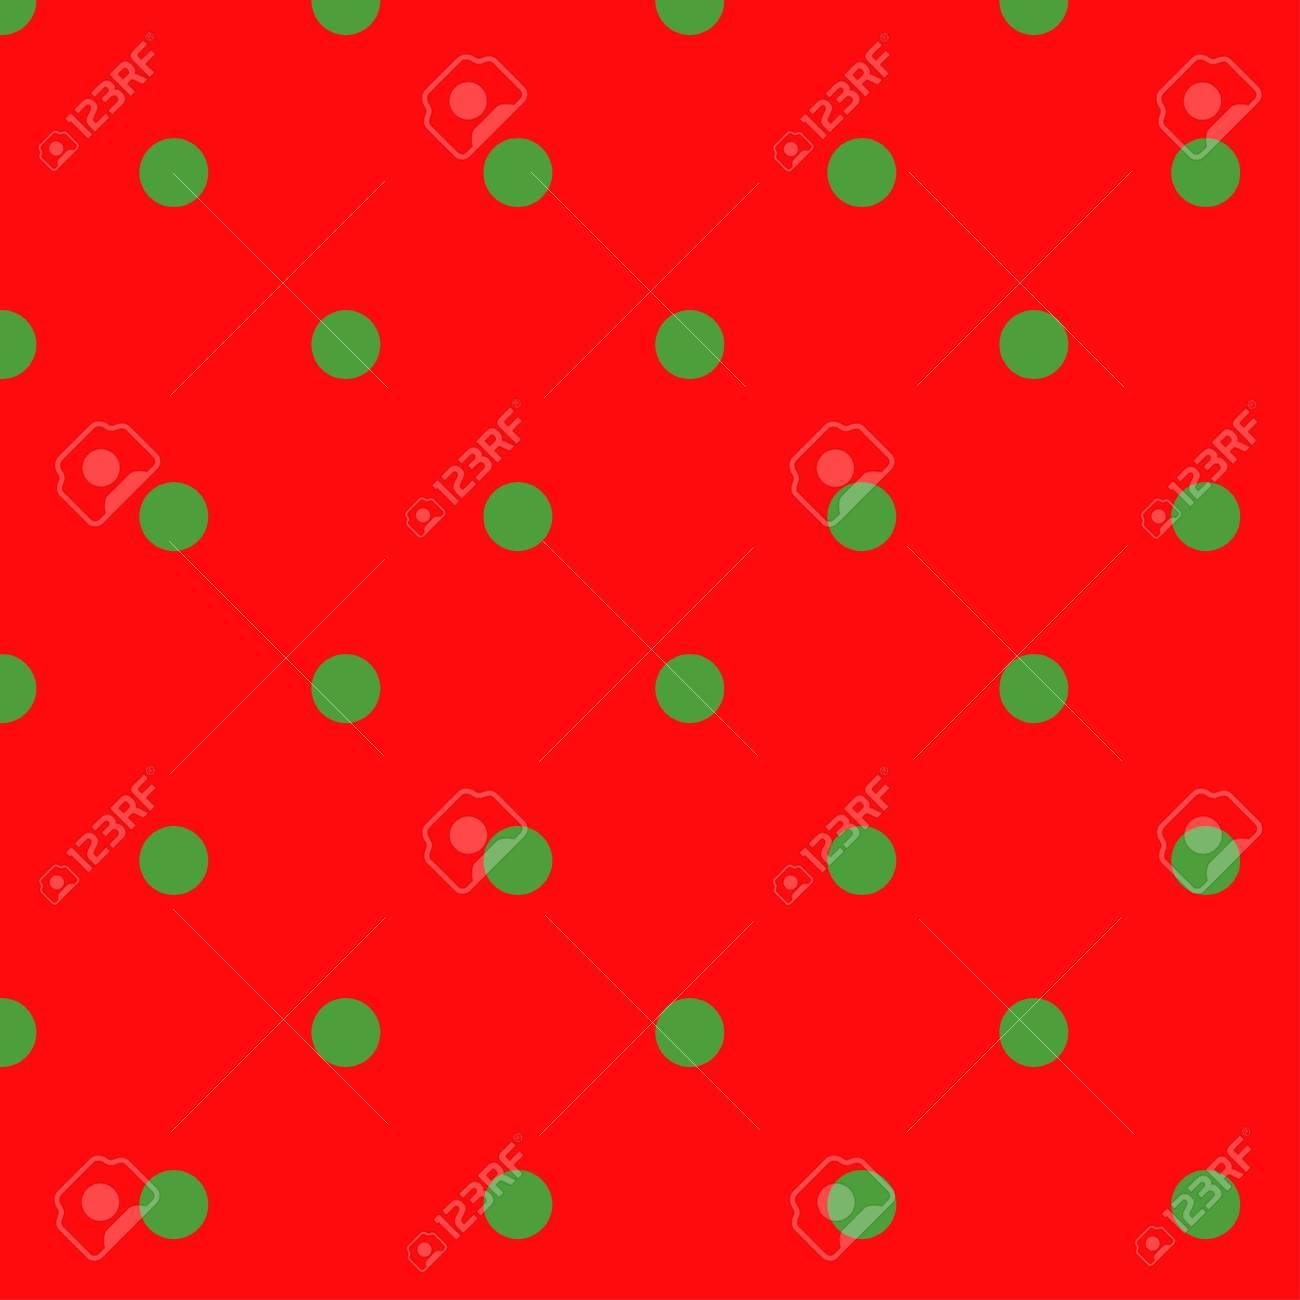 Polka dot background pattern - 114708550